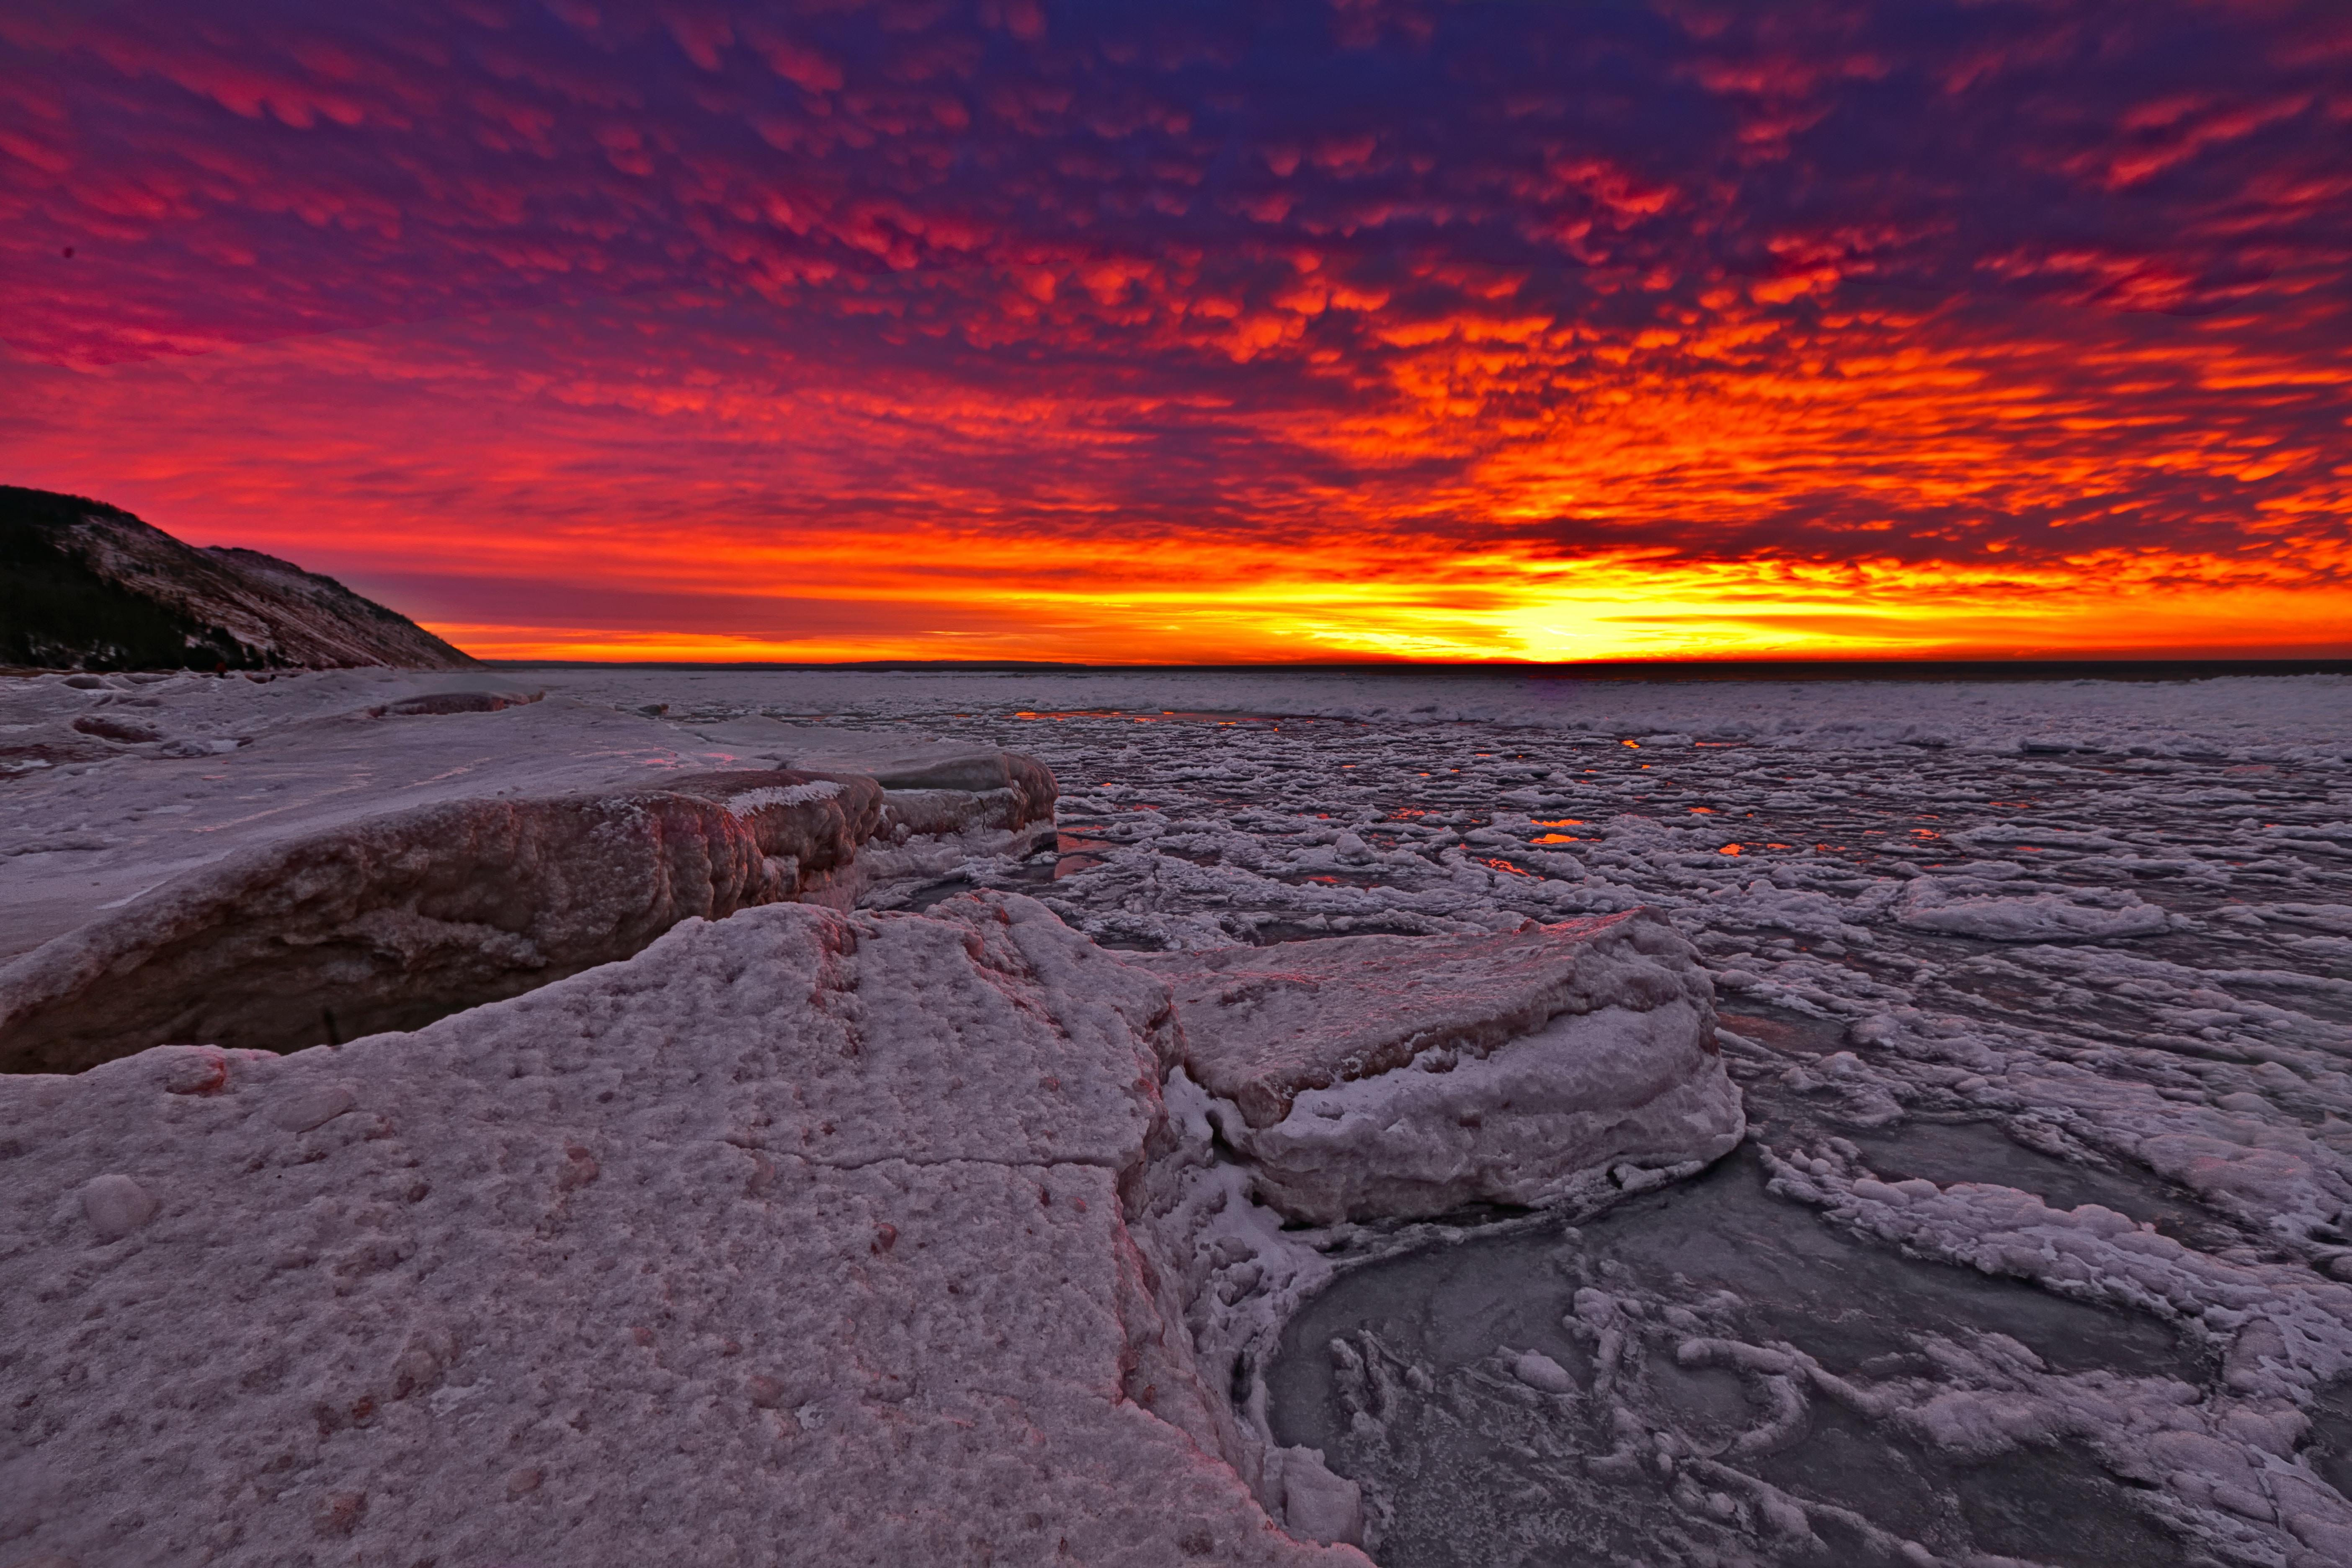 land with snow under golden hour